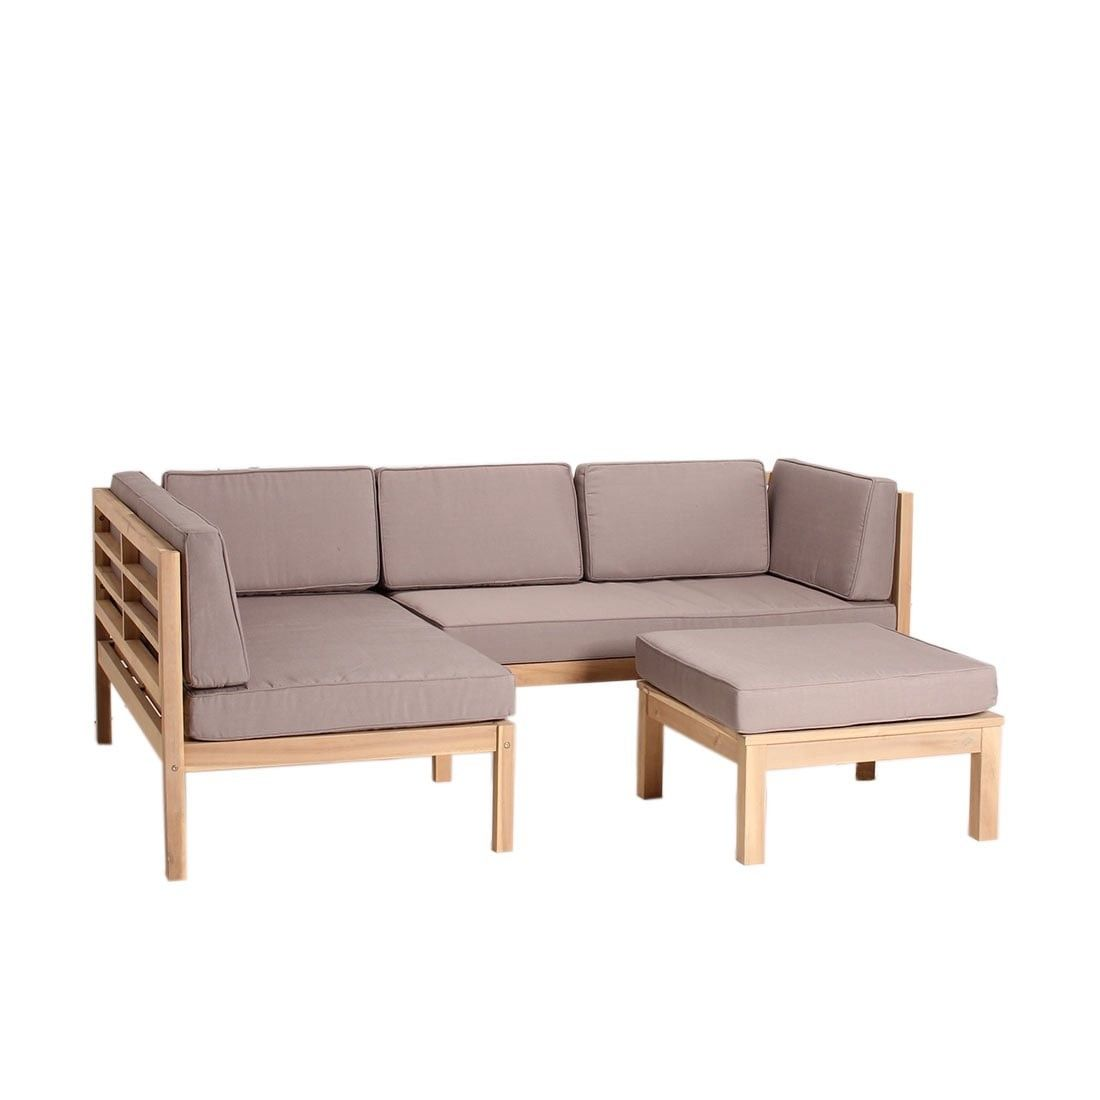 Ikea Beddinge Lovas 3er Bettsofa Bettsofa Sofa Bett